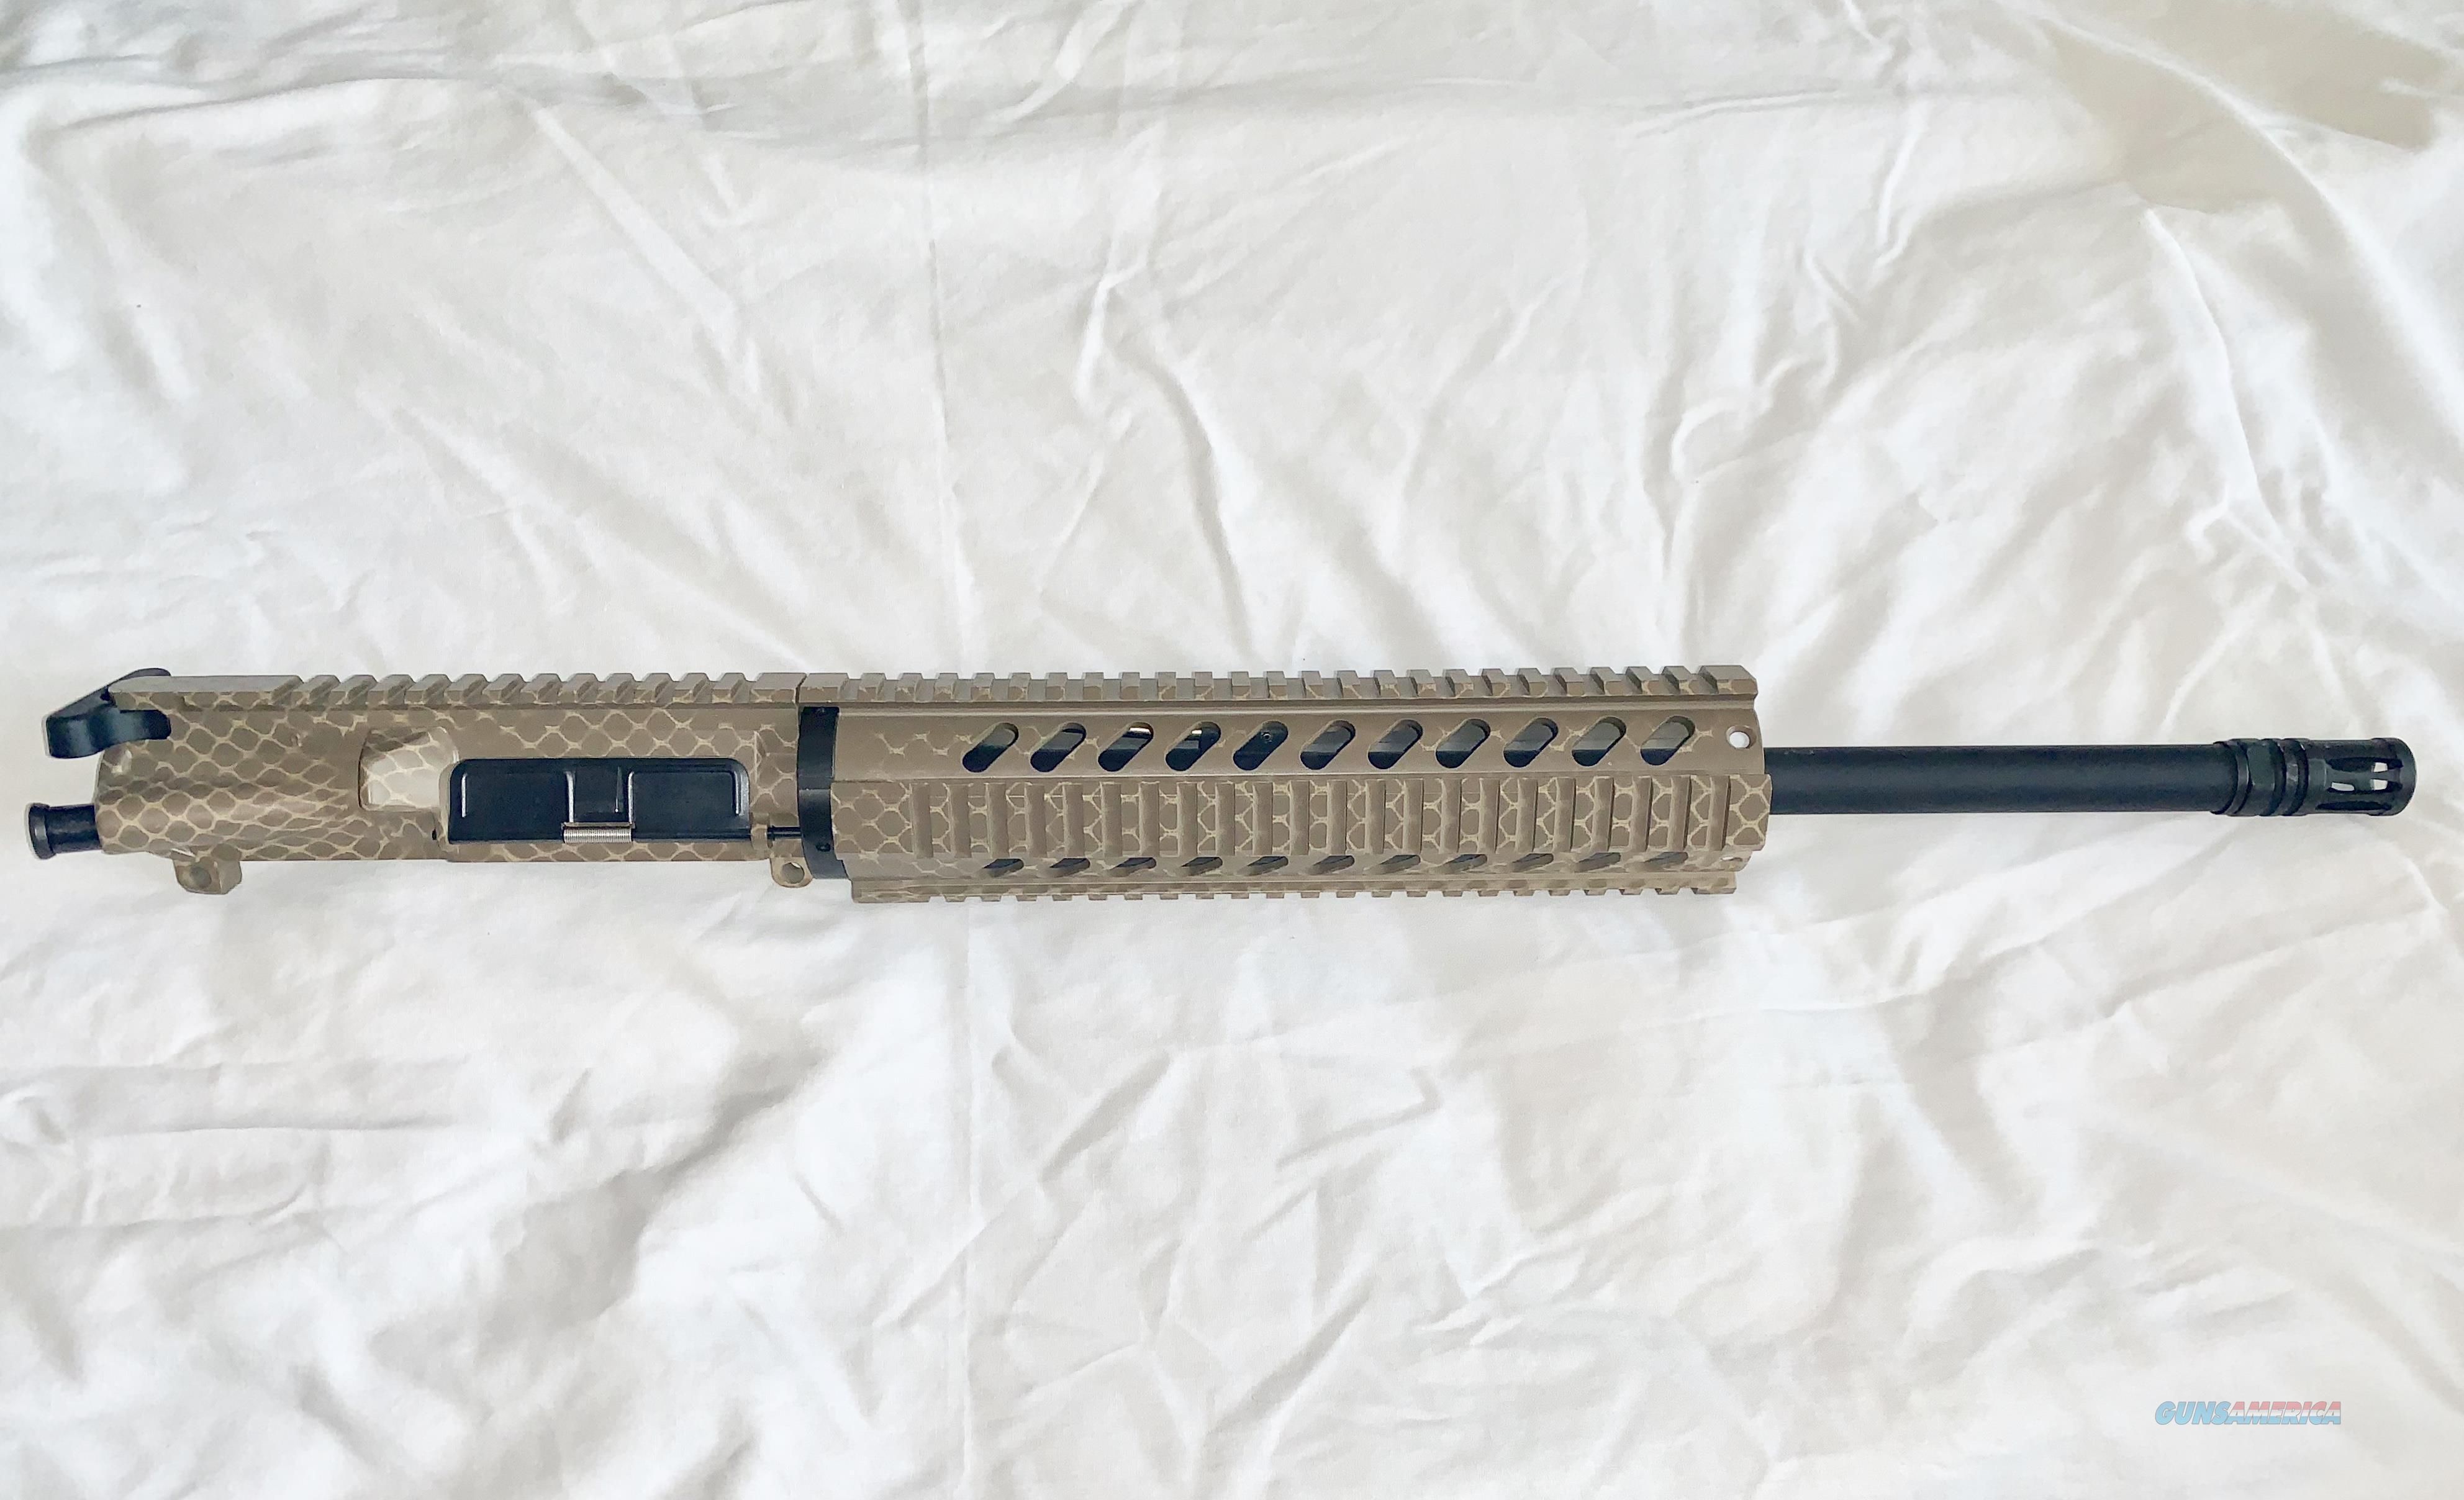 New Revolution Weaponry AR15 Upper- Custom Snake Skin Camo Cerakote- 300 AAC Blackout Barrel- UPK Installed- No BCG  Non-Guns > Gun Parts > M16-AR15 > Upper Only